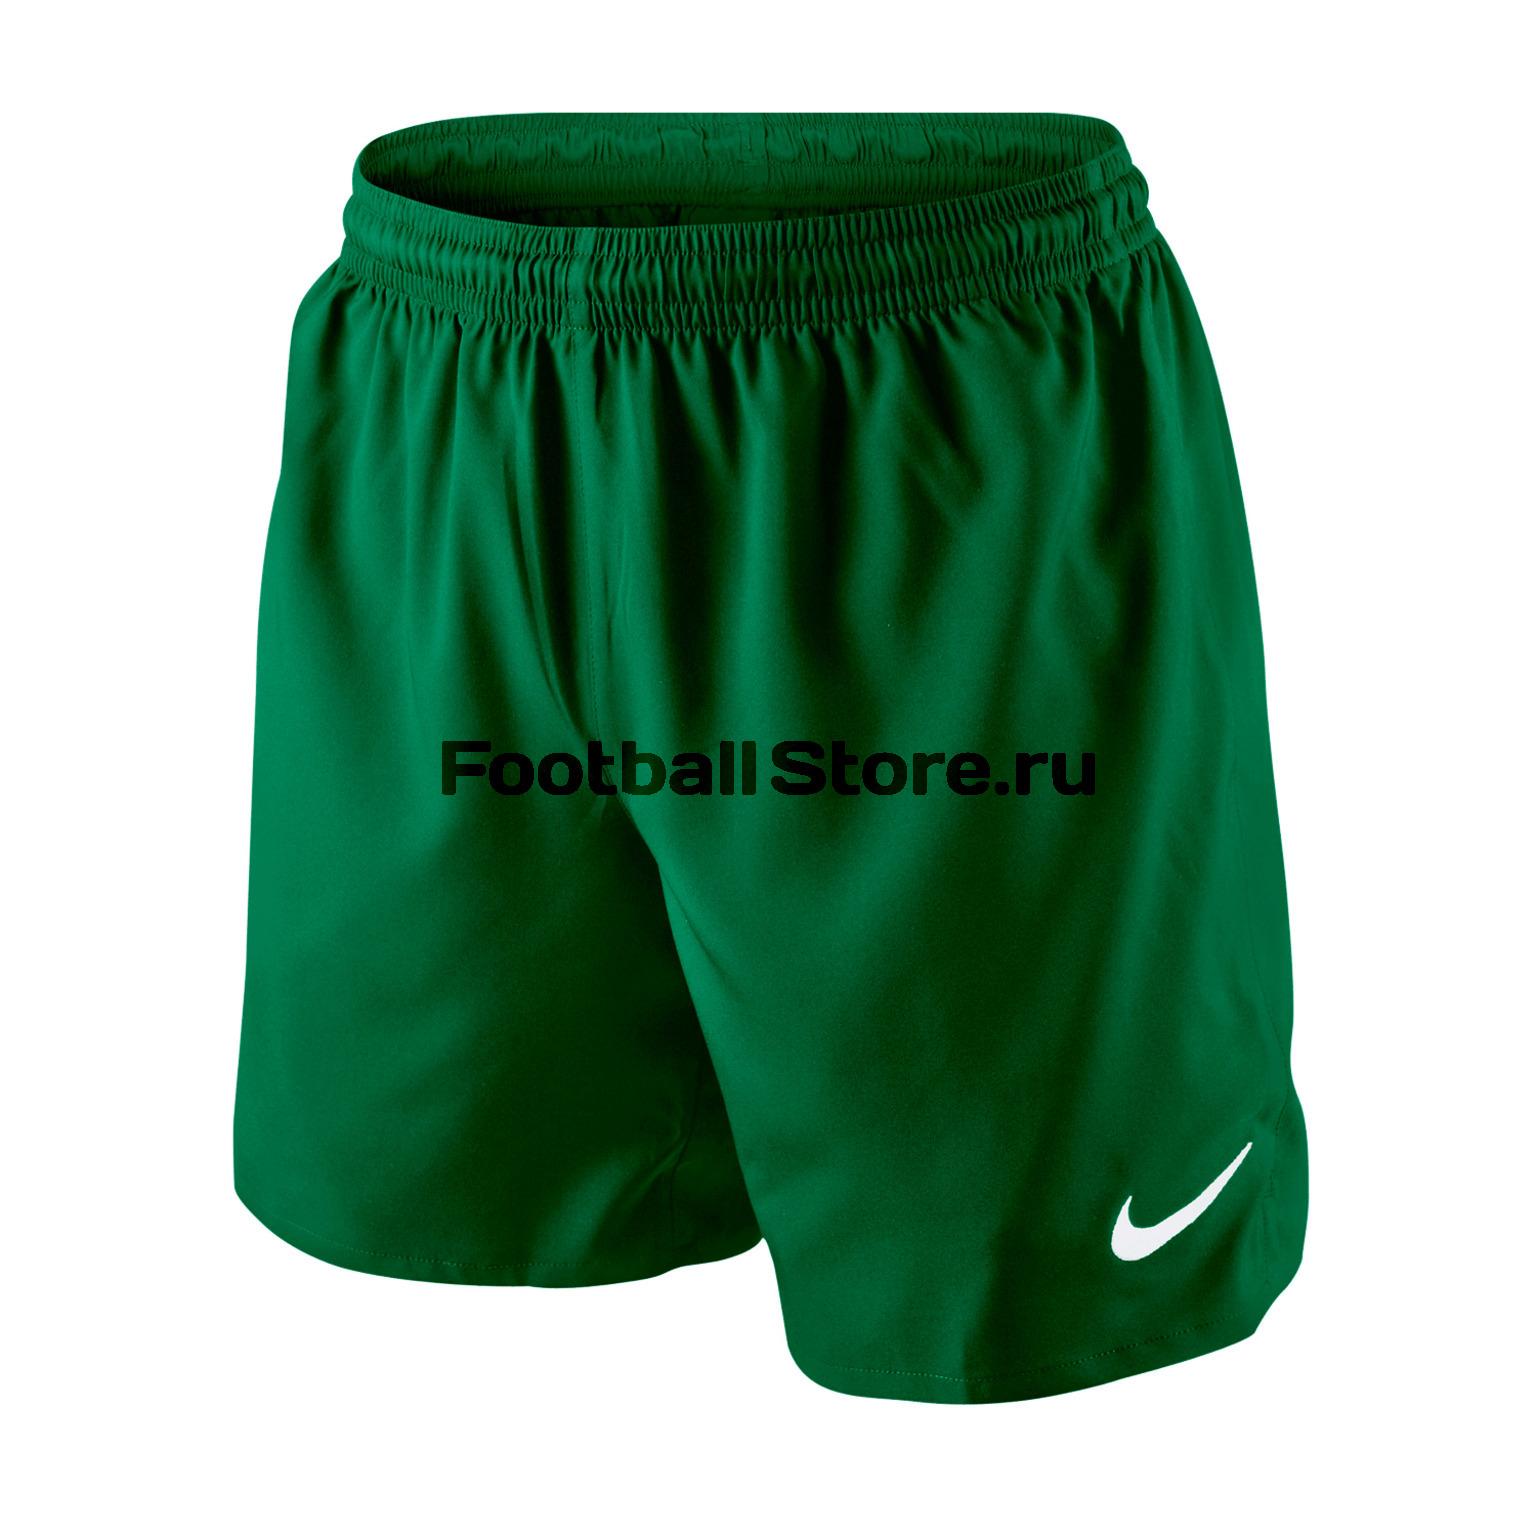 Шорты Nike Трусы игровые Nike Classic Woven Short Unlined 473829-302